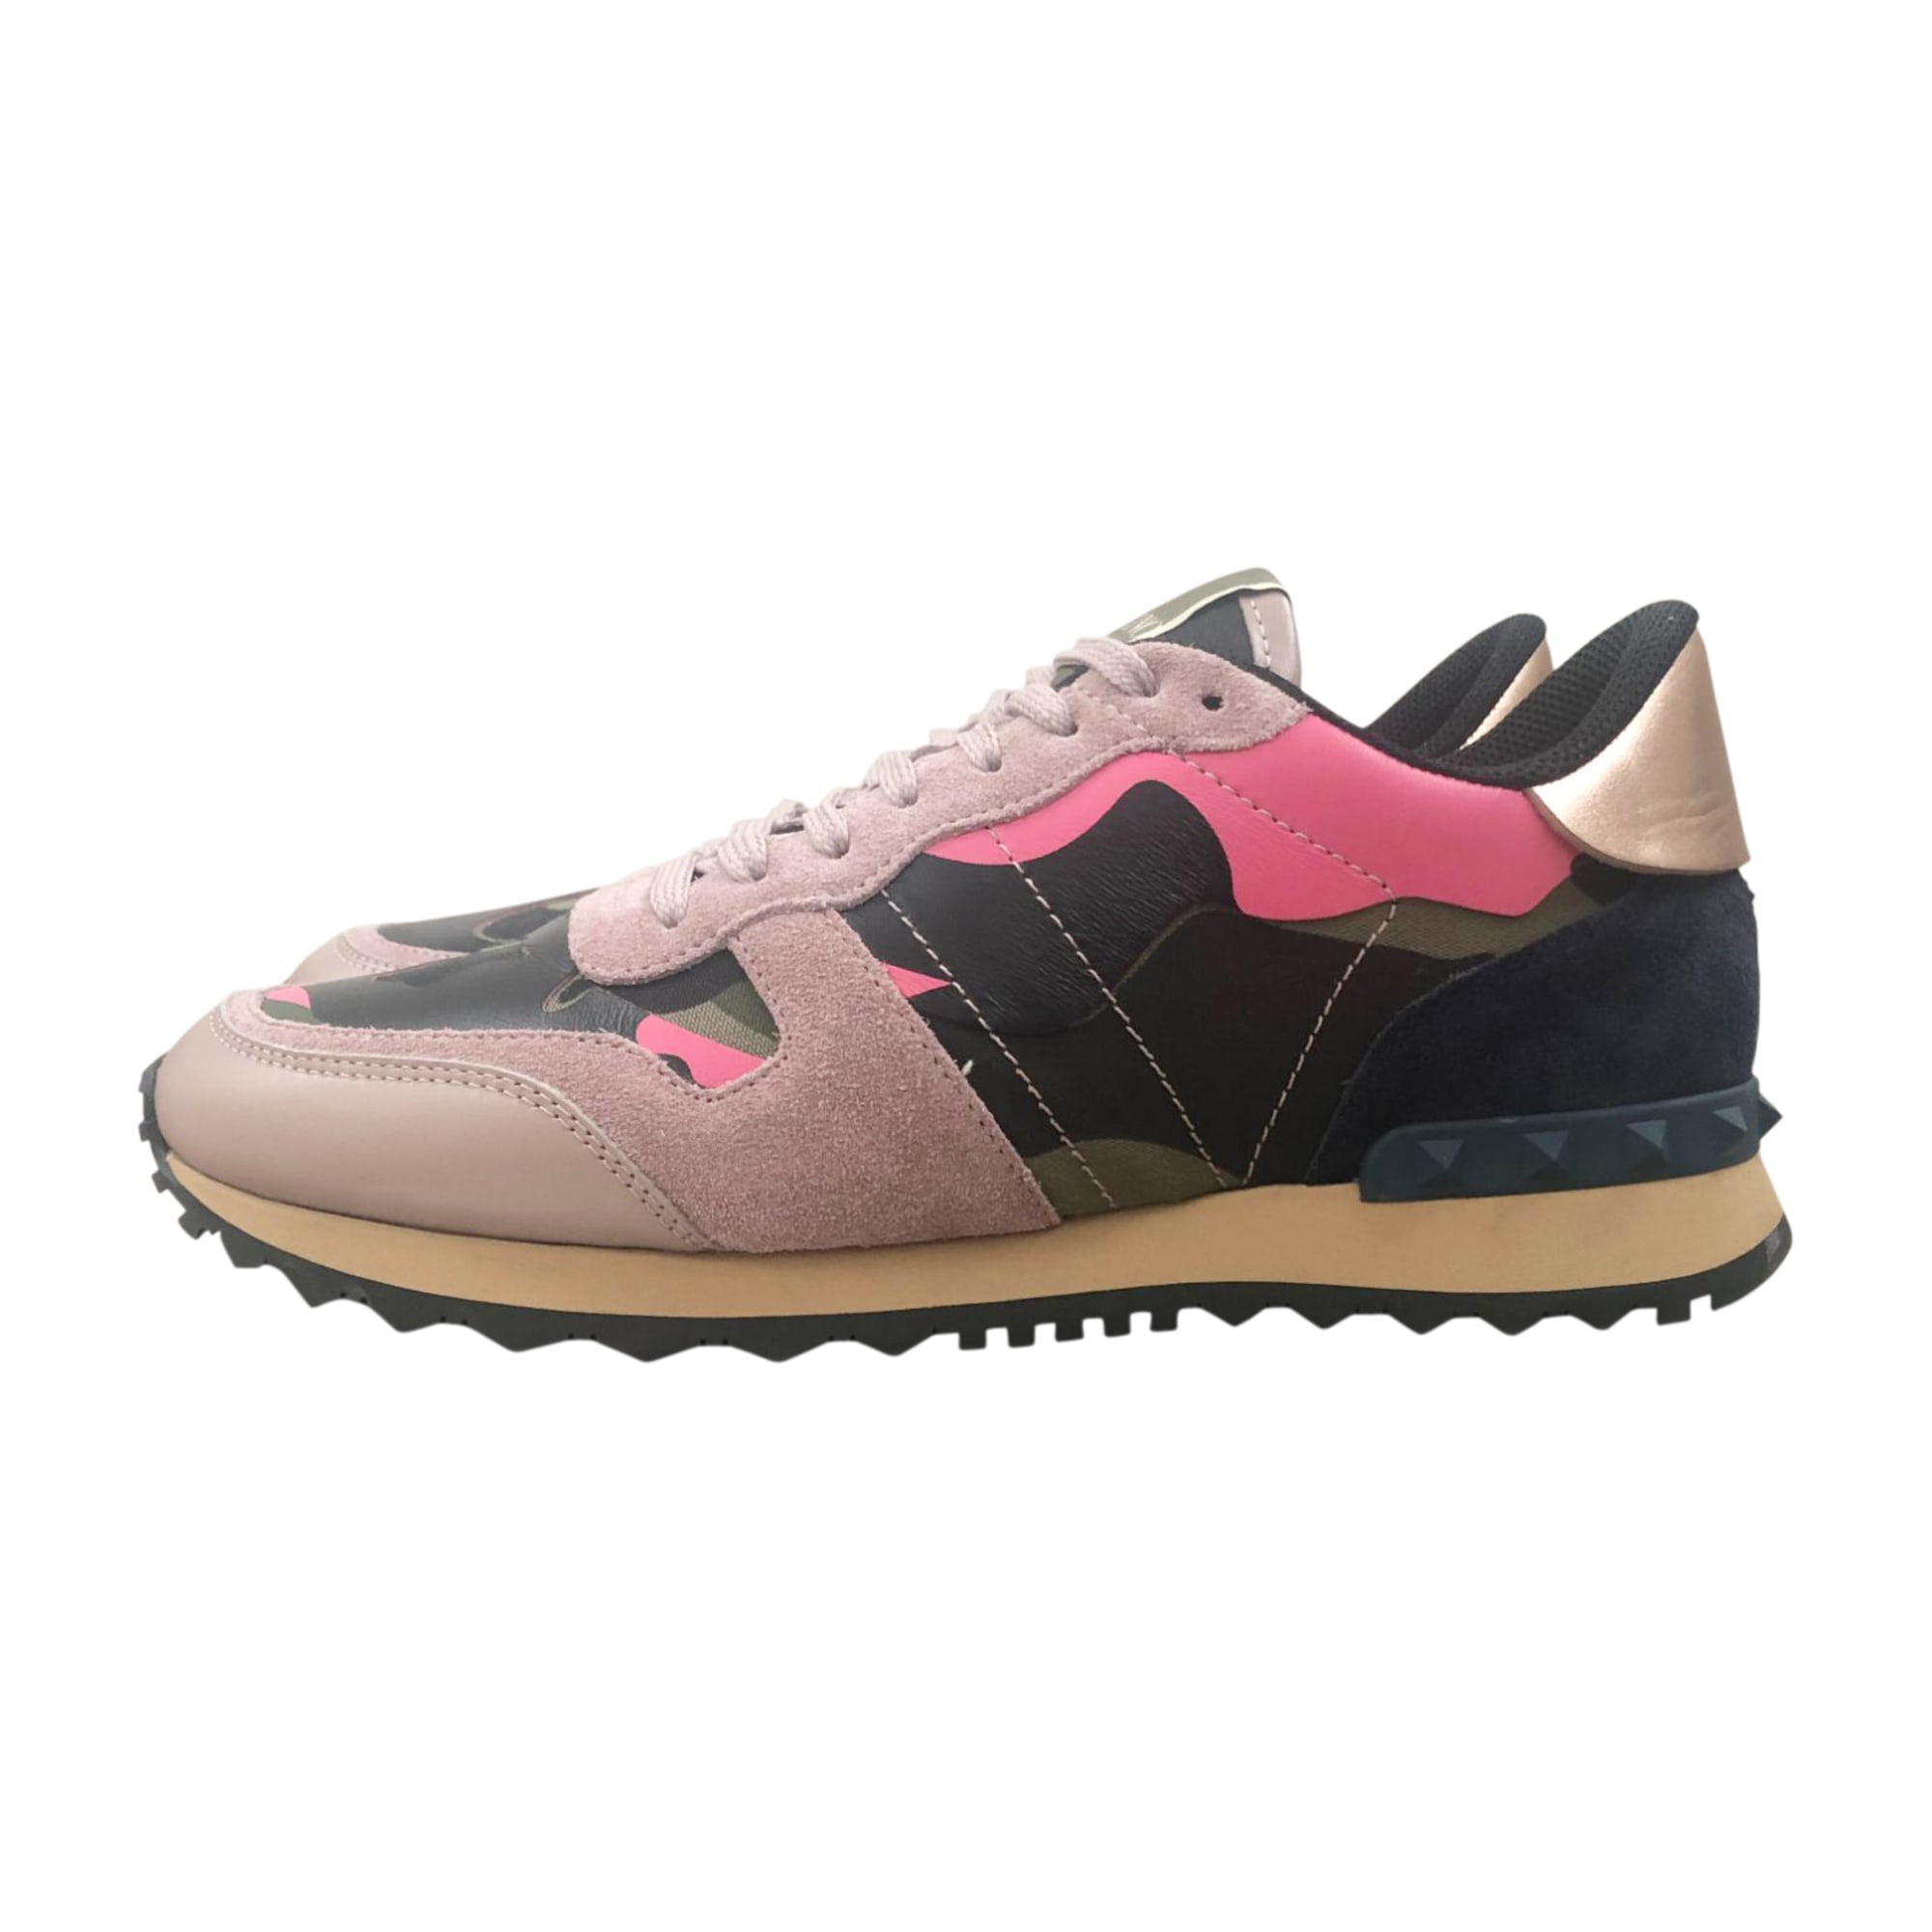 Sneakers VALENTINO Rockrunner Multicolor